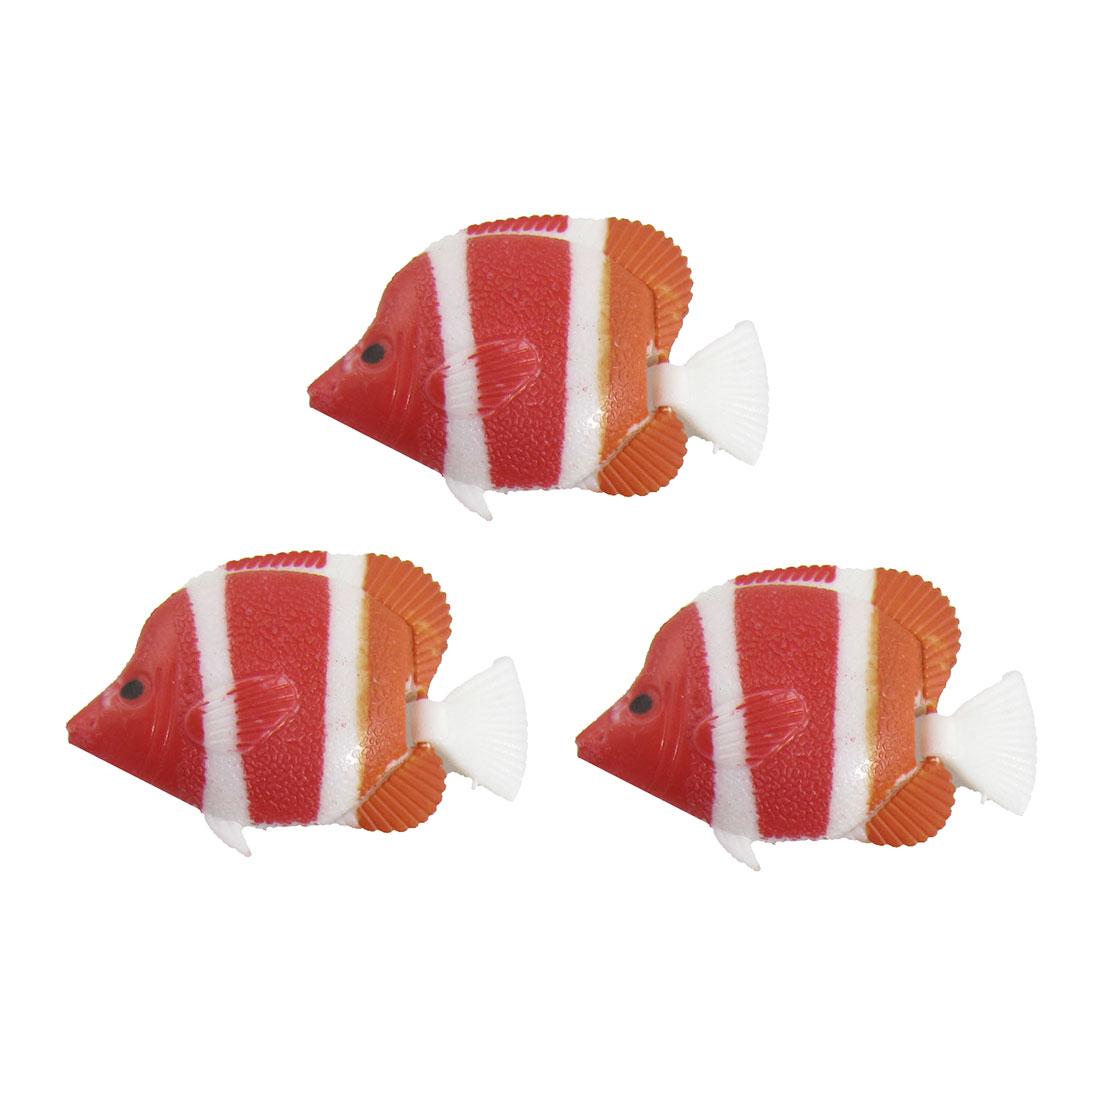 3 Pcs Wiggling Tail Colored Plastic Fish Ornament for Aquarium